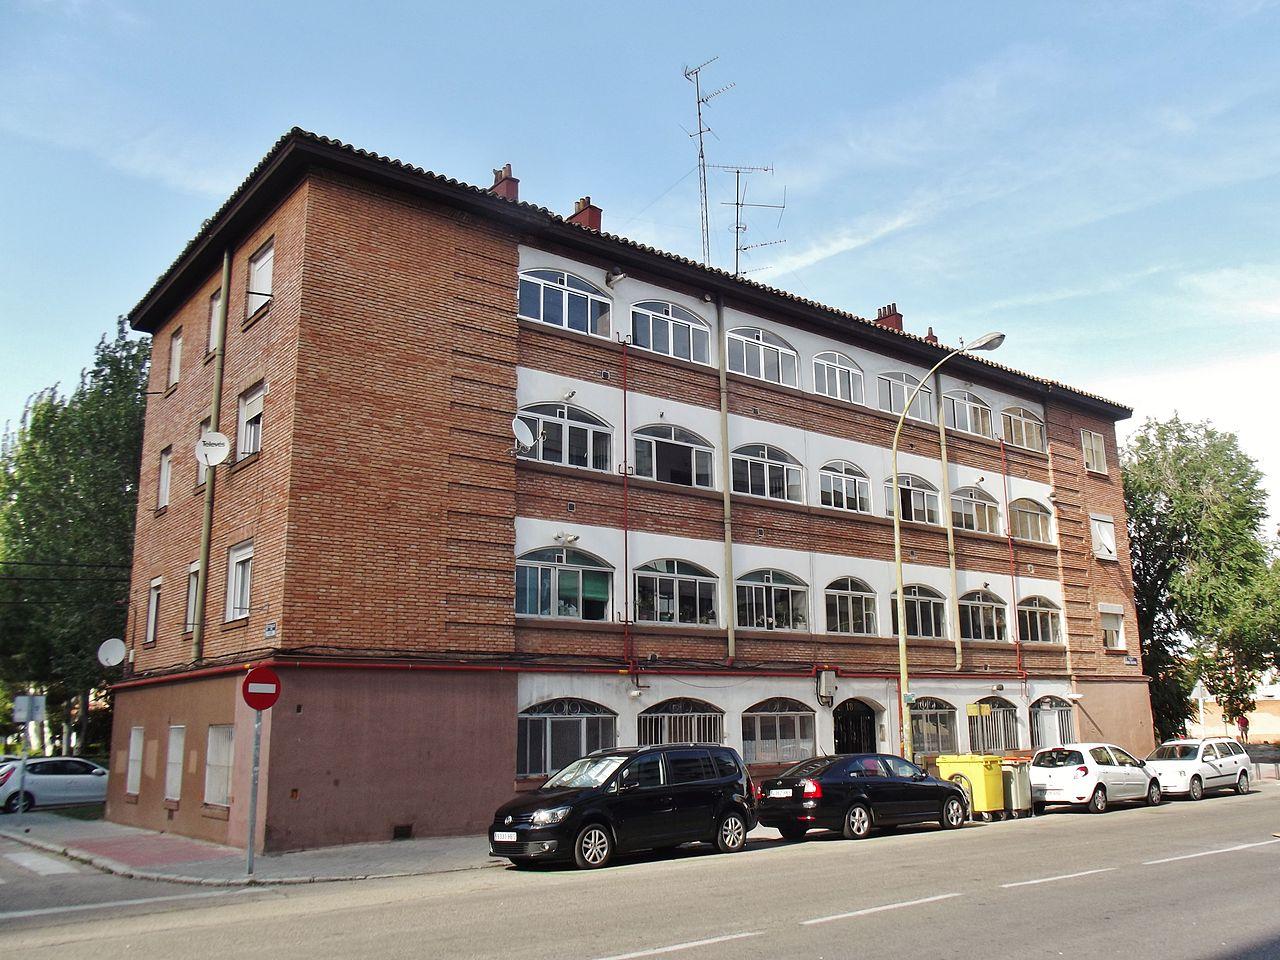 Archivo calle manuel caldeiro 18 madrid jpg wikipedia - H m calle orense madrid ...